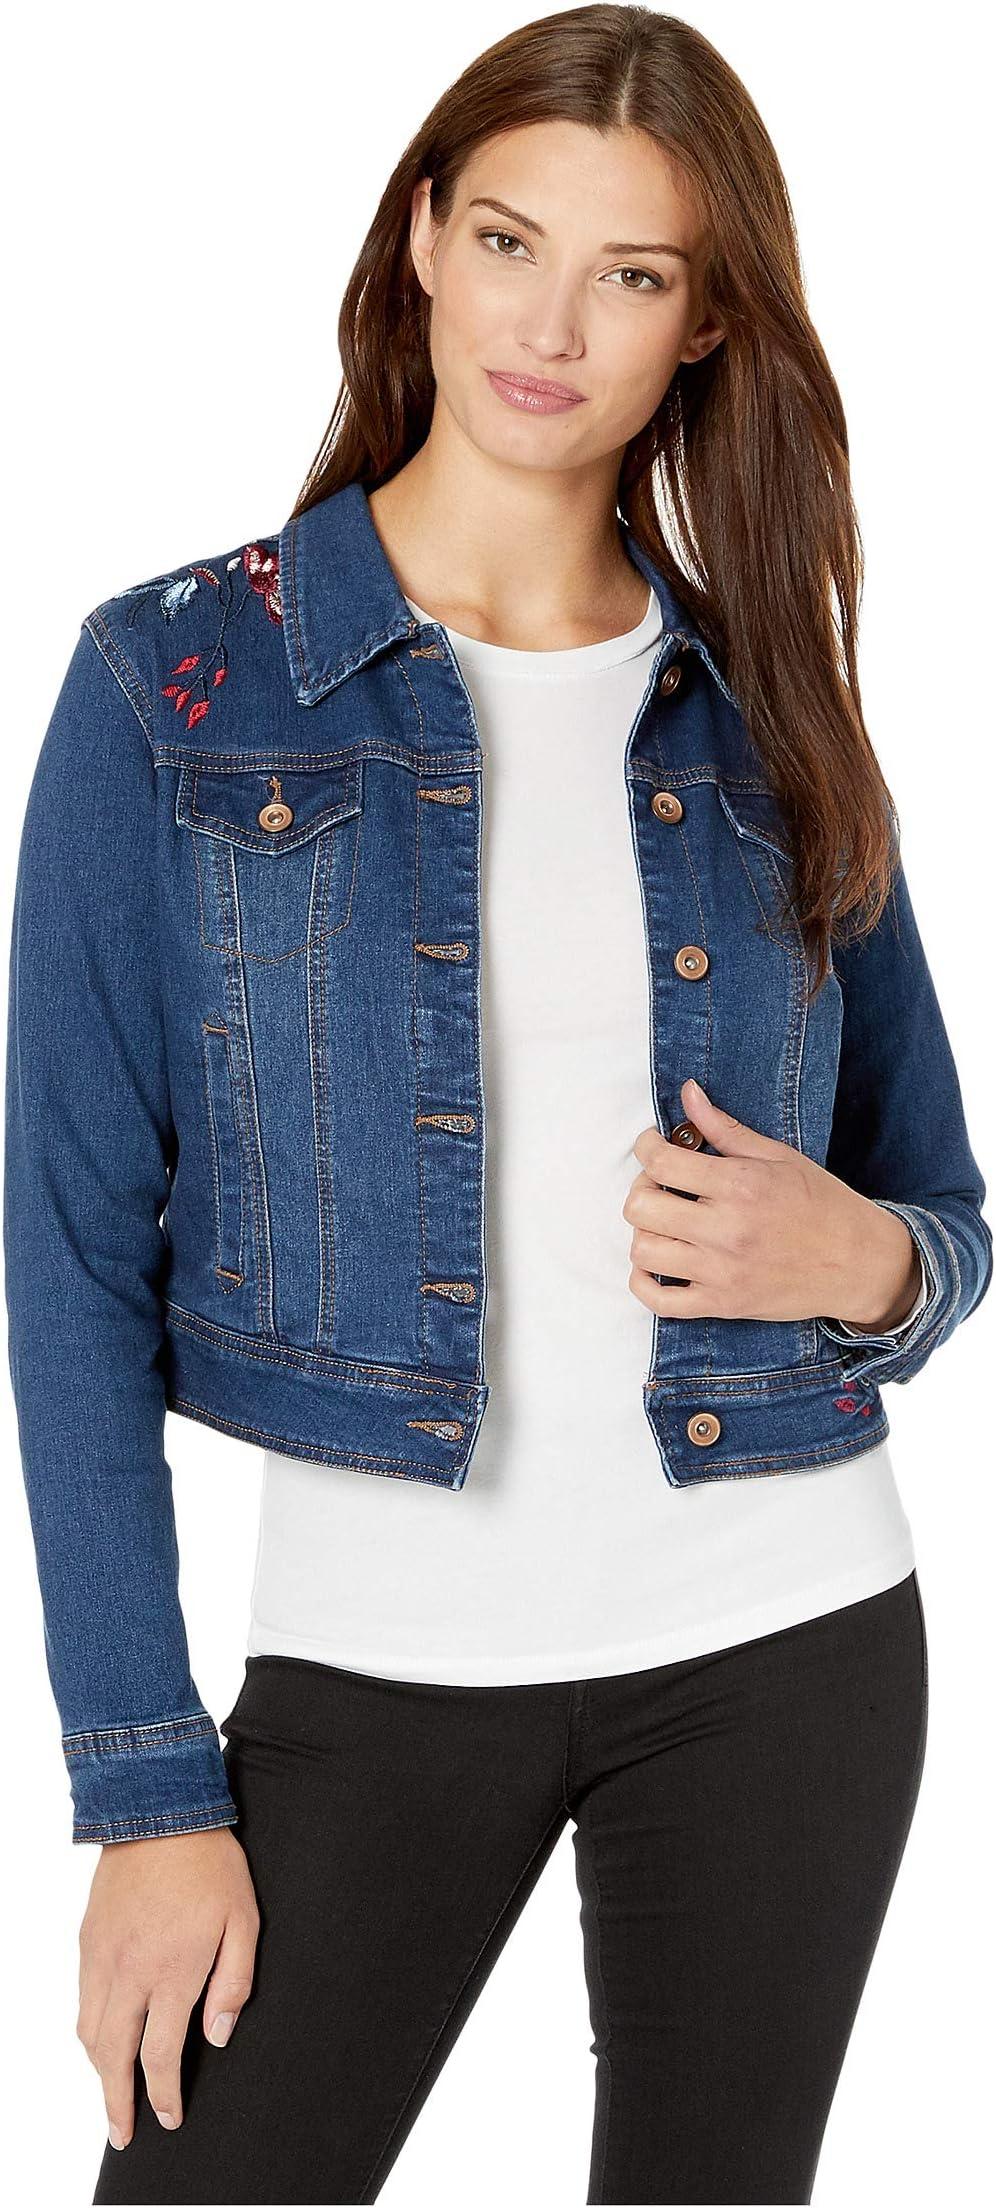 TC-6-Coats-Outerwear-2019-09-27